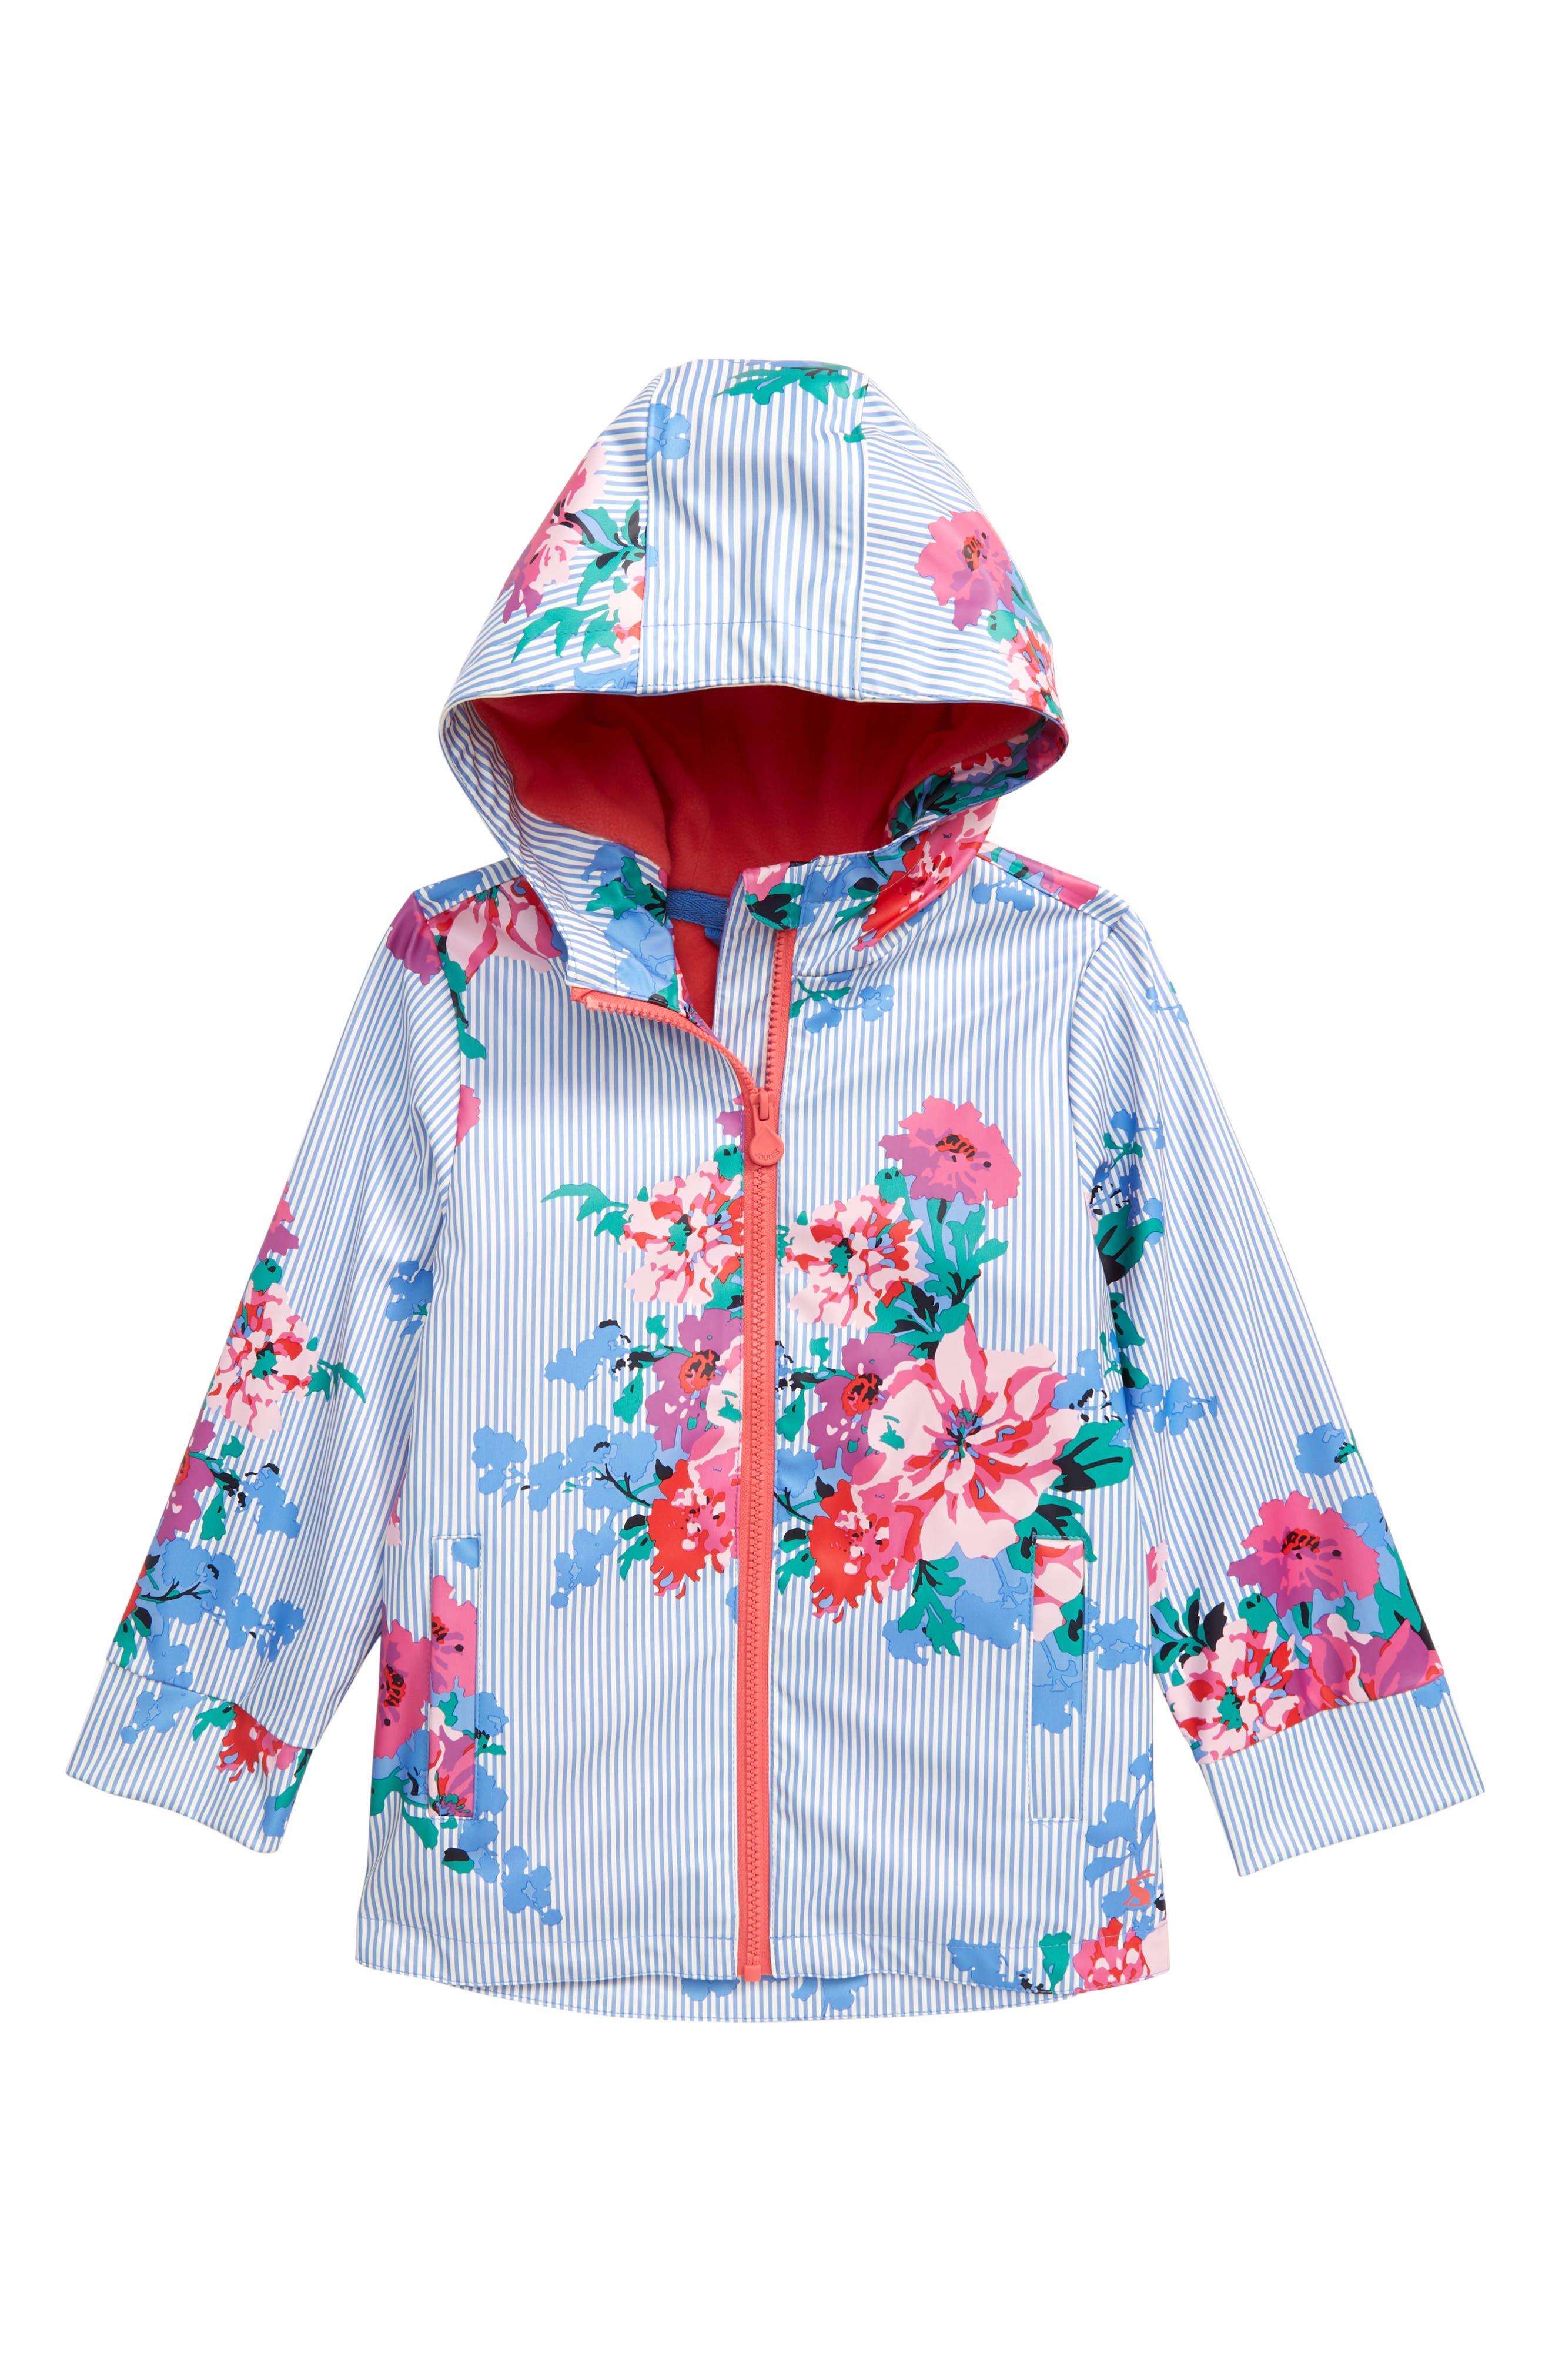 Toddler Girls Joules Raindance Waterproof Rain Jacket Size 2Y  Blue